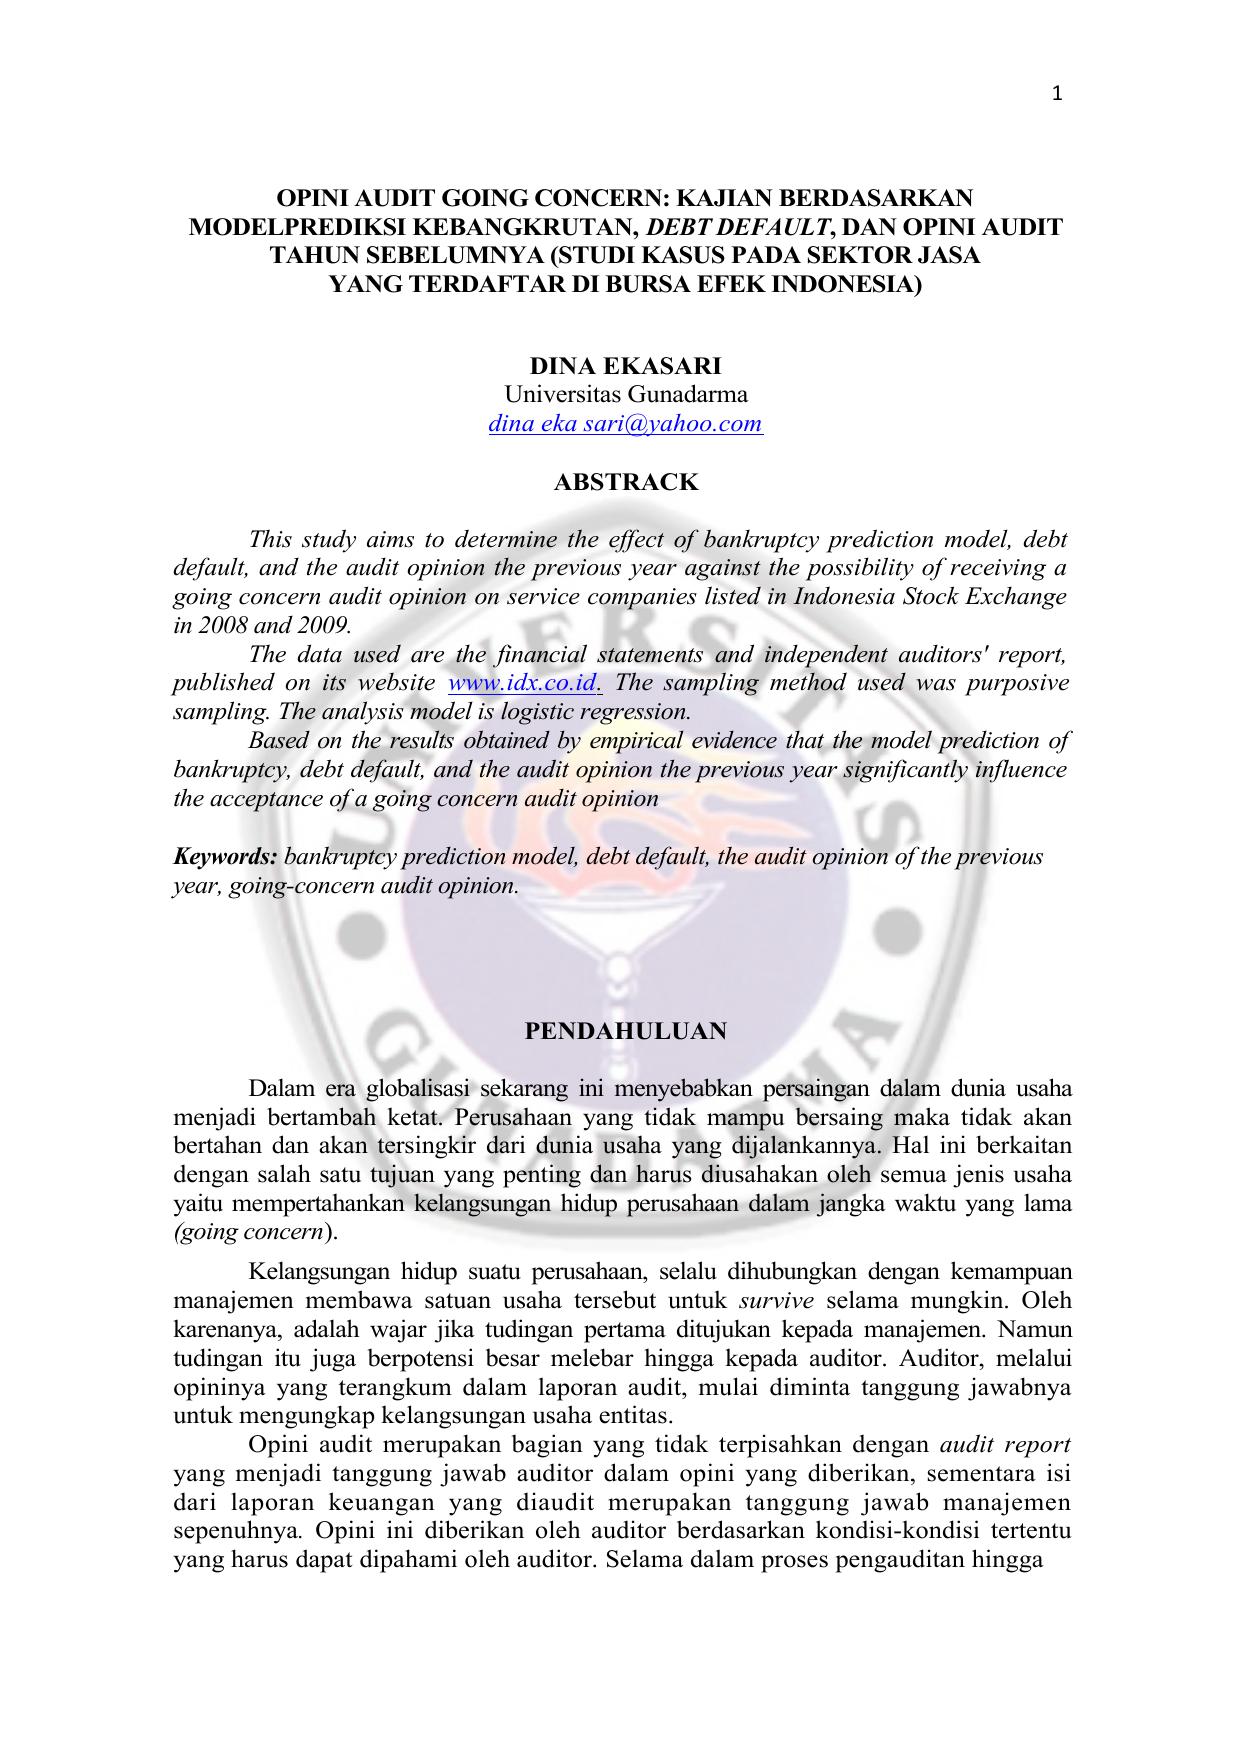 Opini Audit Going Concern Repository Universitas Gunadarma